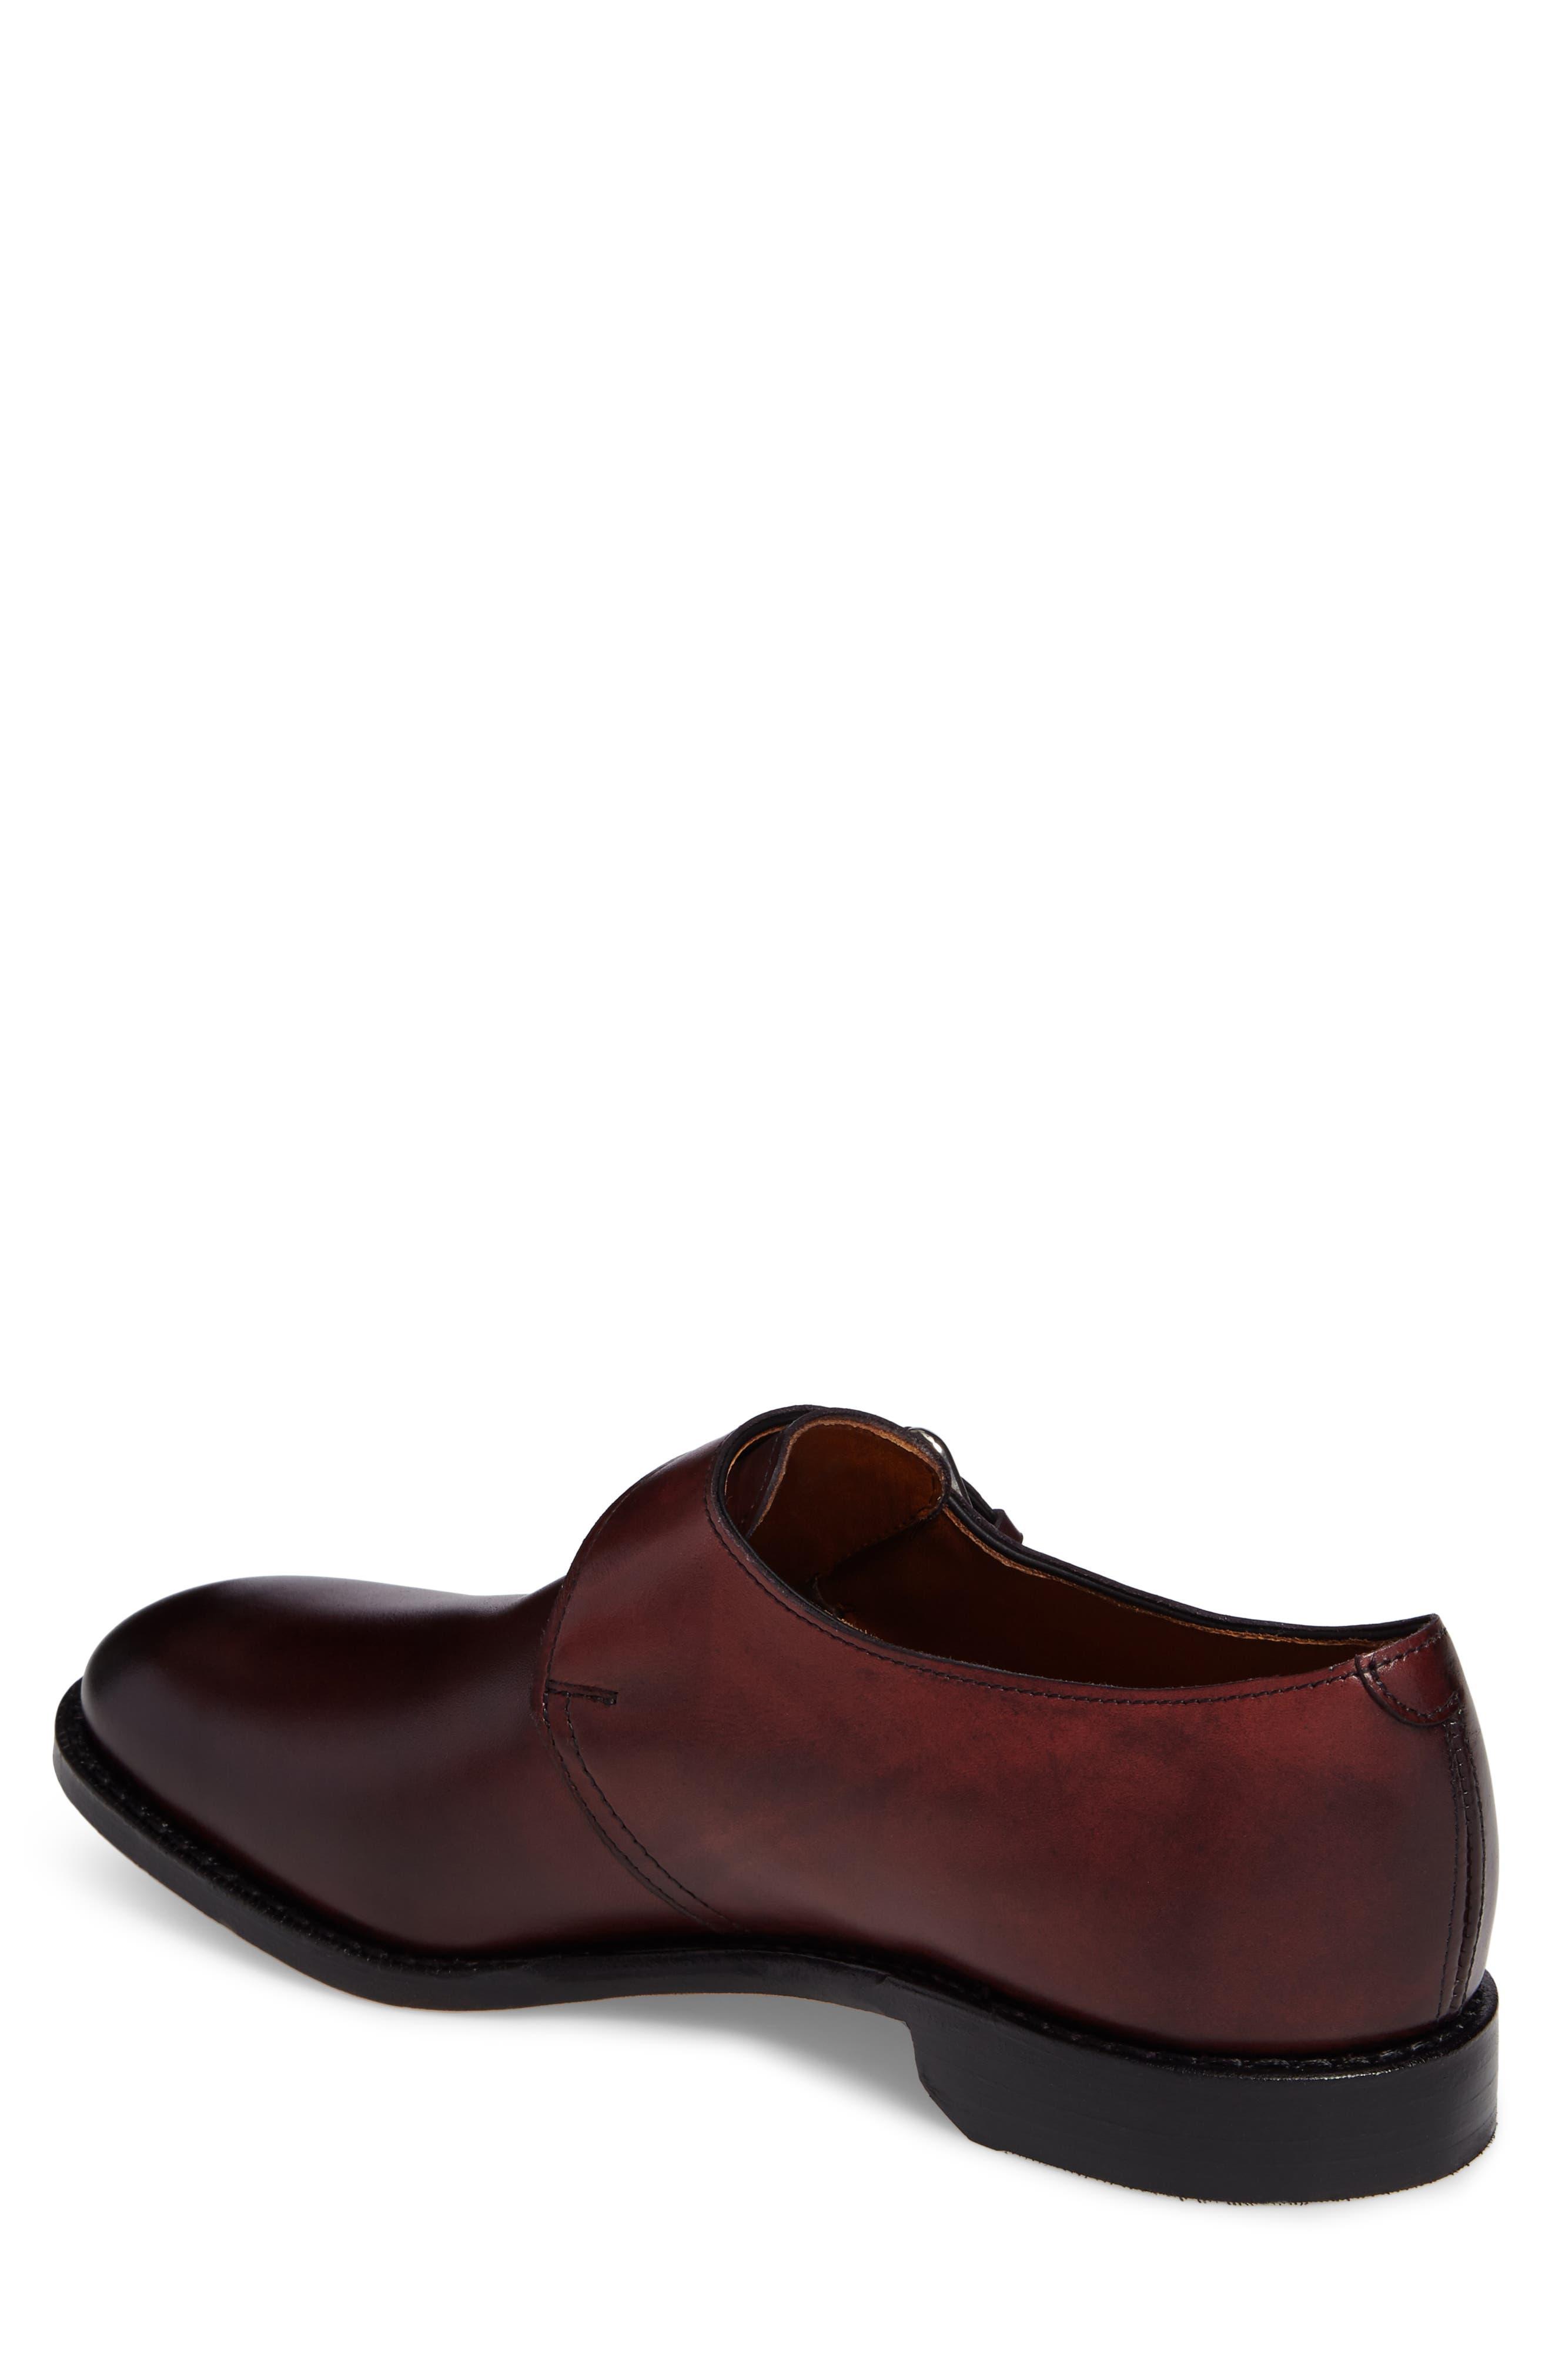 Warwick Monk Strap Shoe,                             Alternate thumbnail 2, color,                             Oxblood Leather